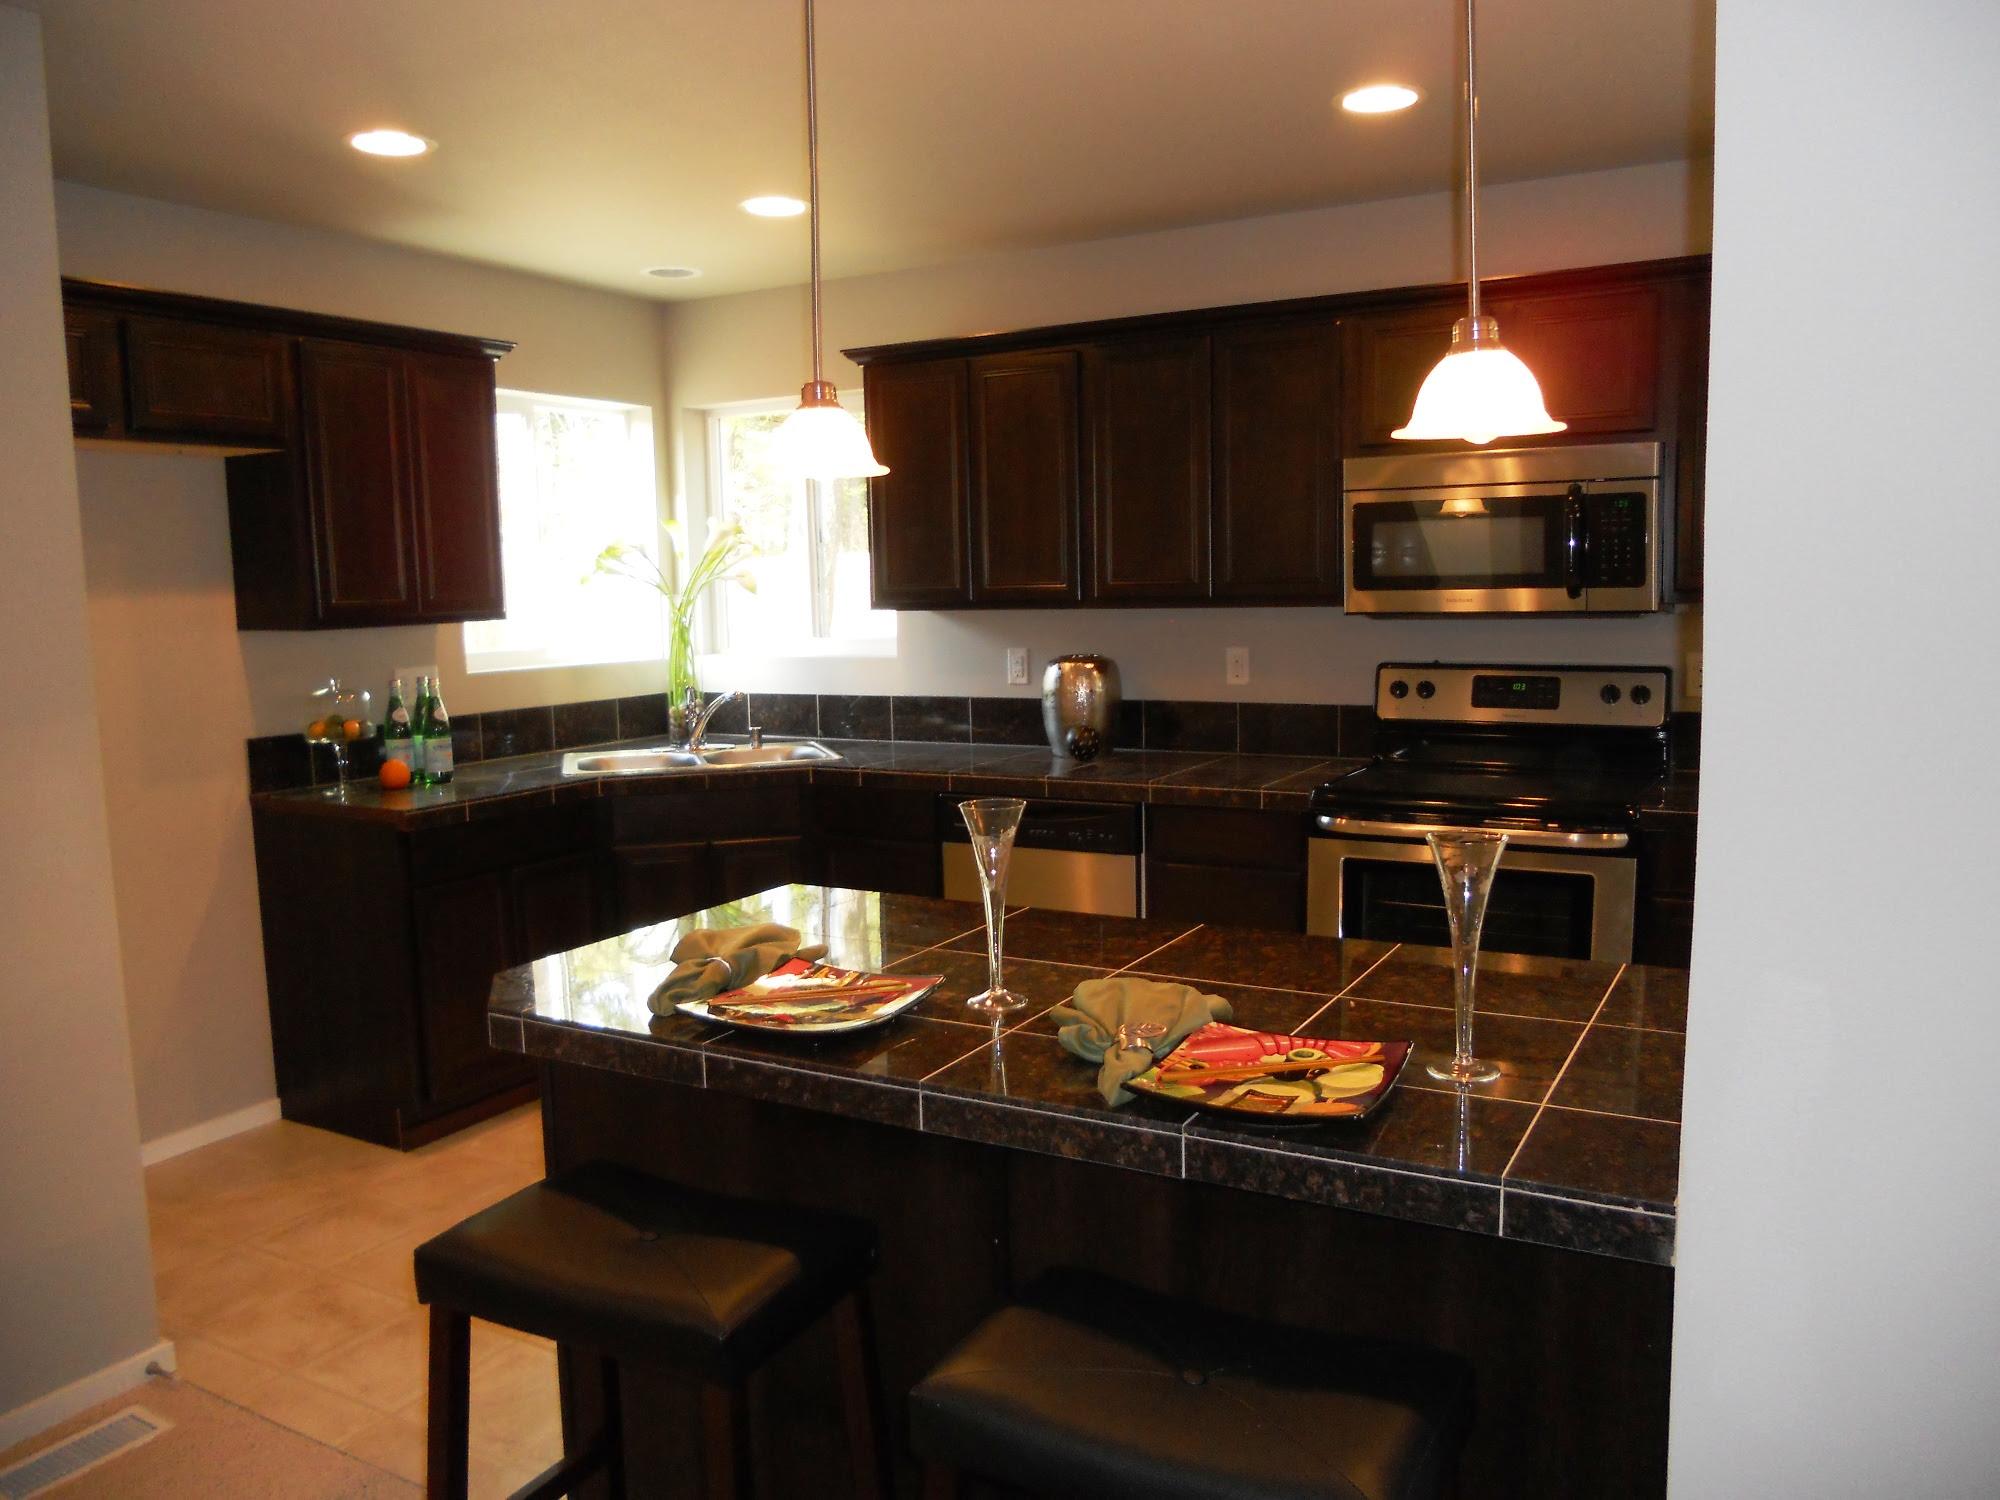 New Model Kitchen Designs | Joy Studio Design Gallery ...